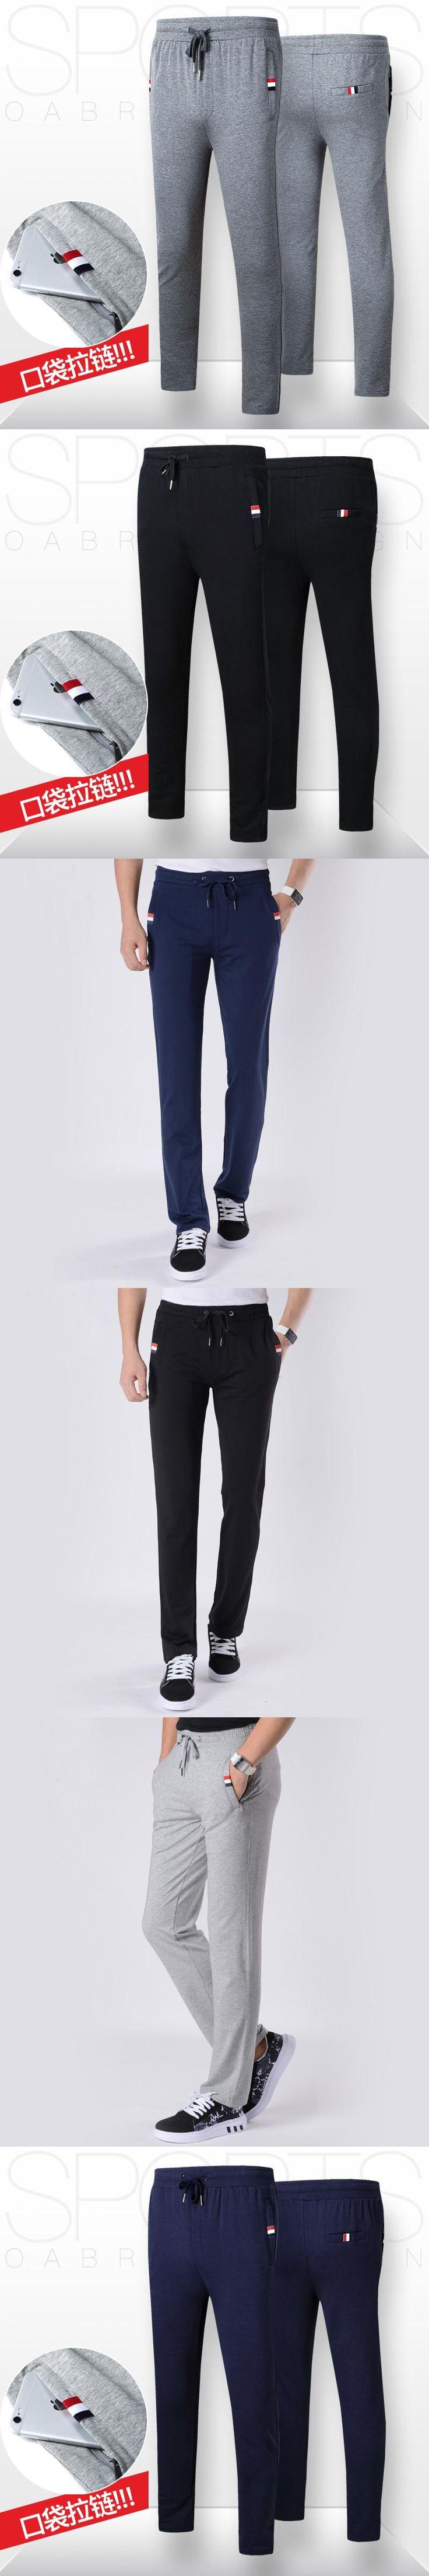 mcilam New Fashion Men's Pants, Male Fitness Workout Pants,Sweatpants Trousers Jogger Pants